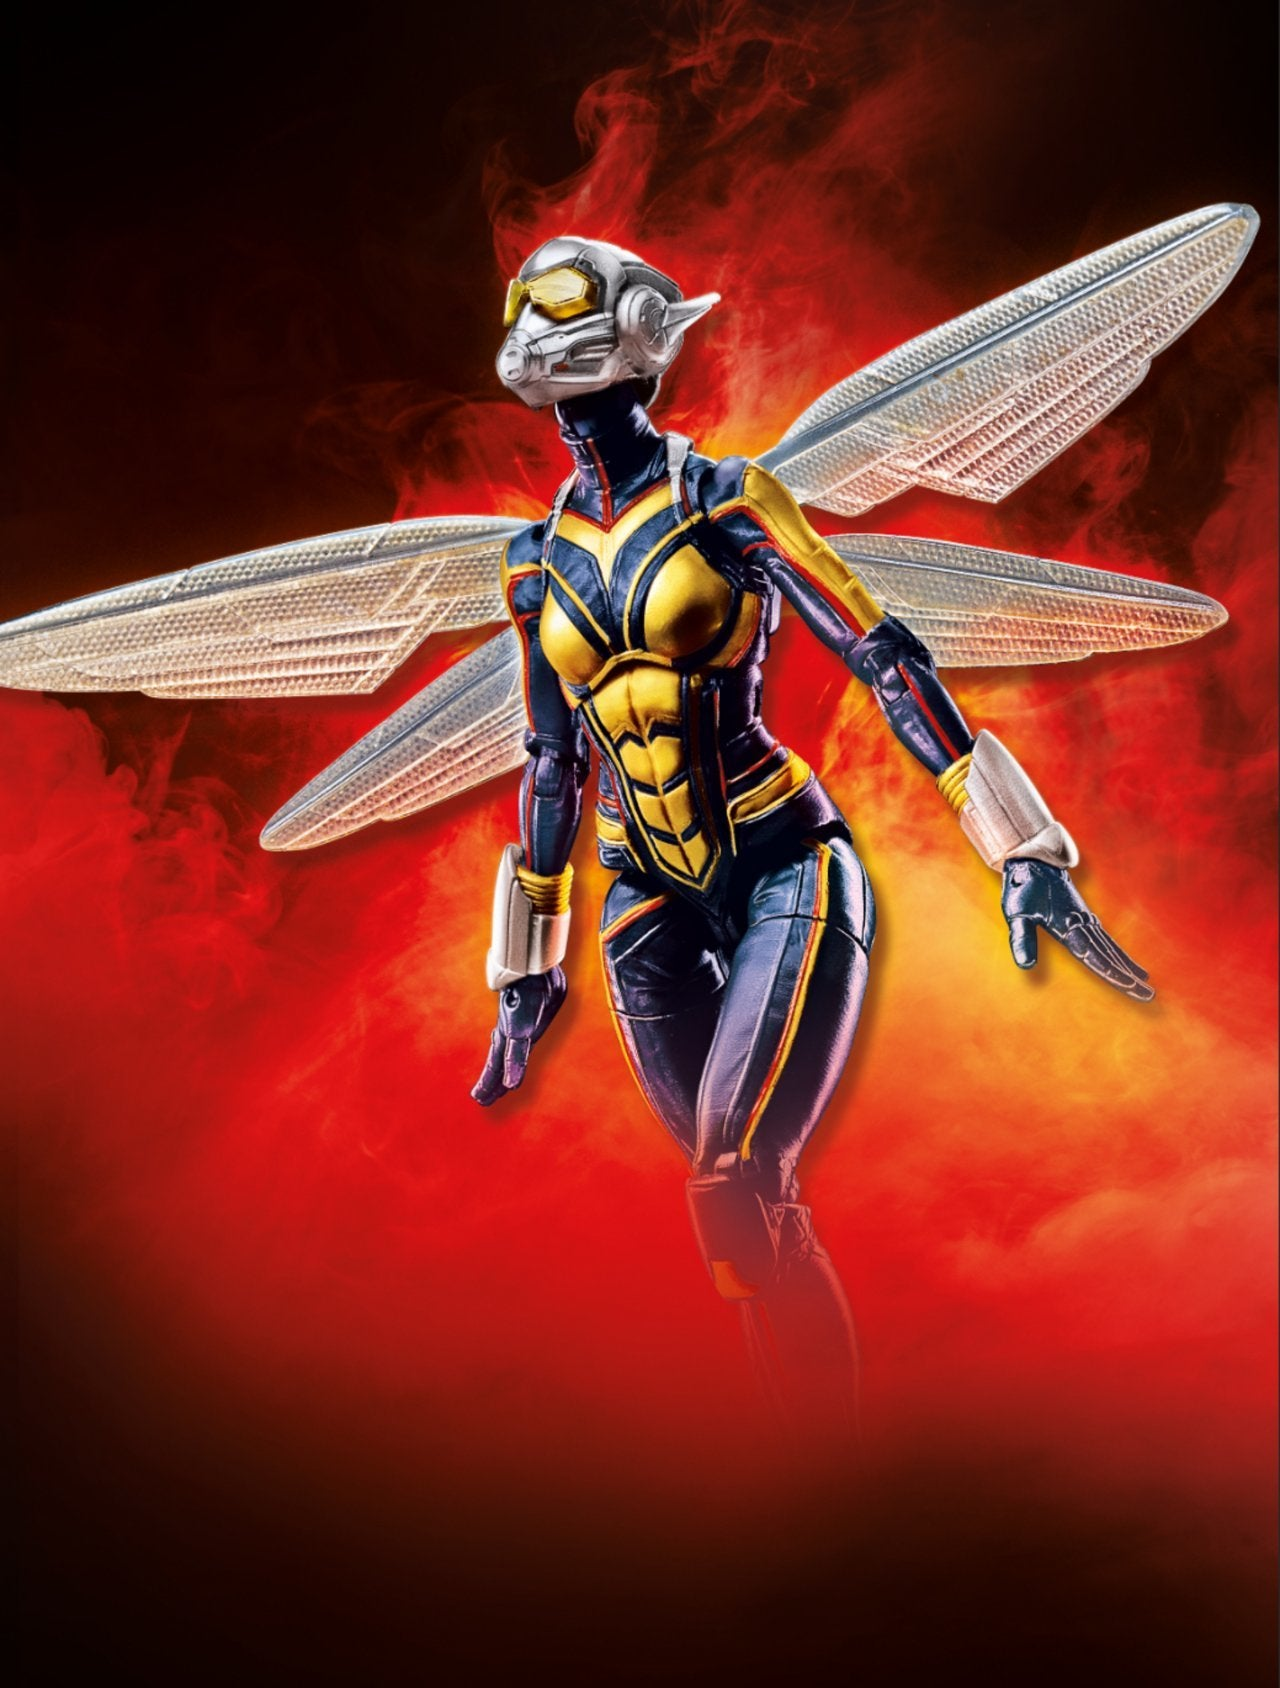 Avengers Infinity War Hasbro Figures - Wasp